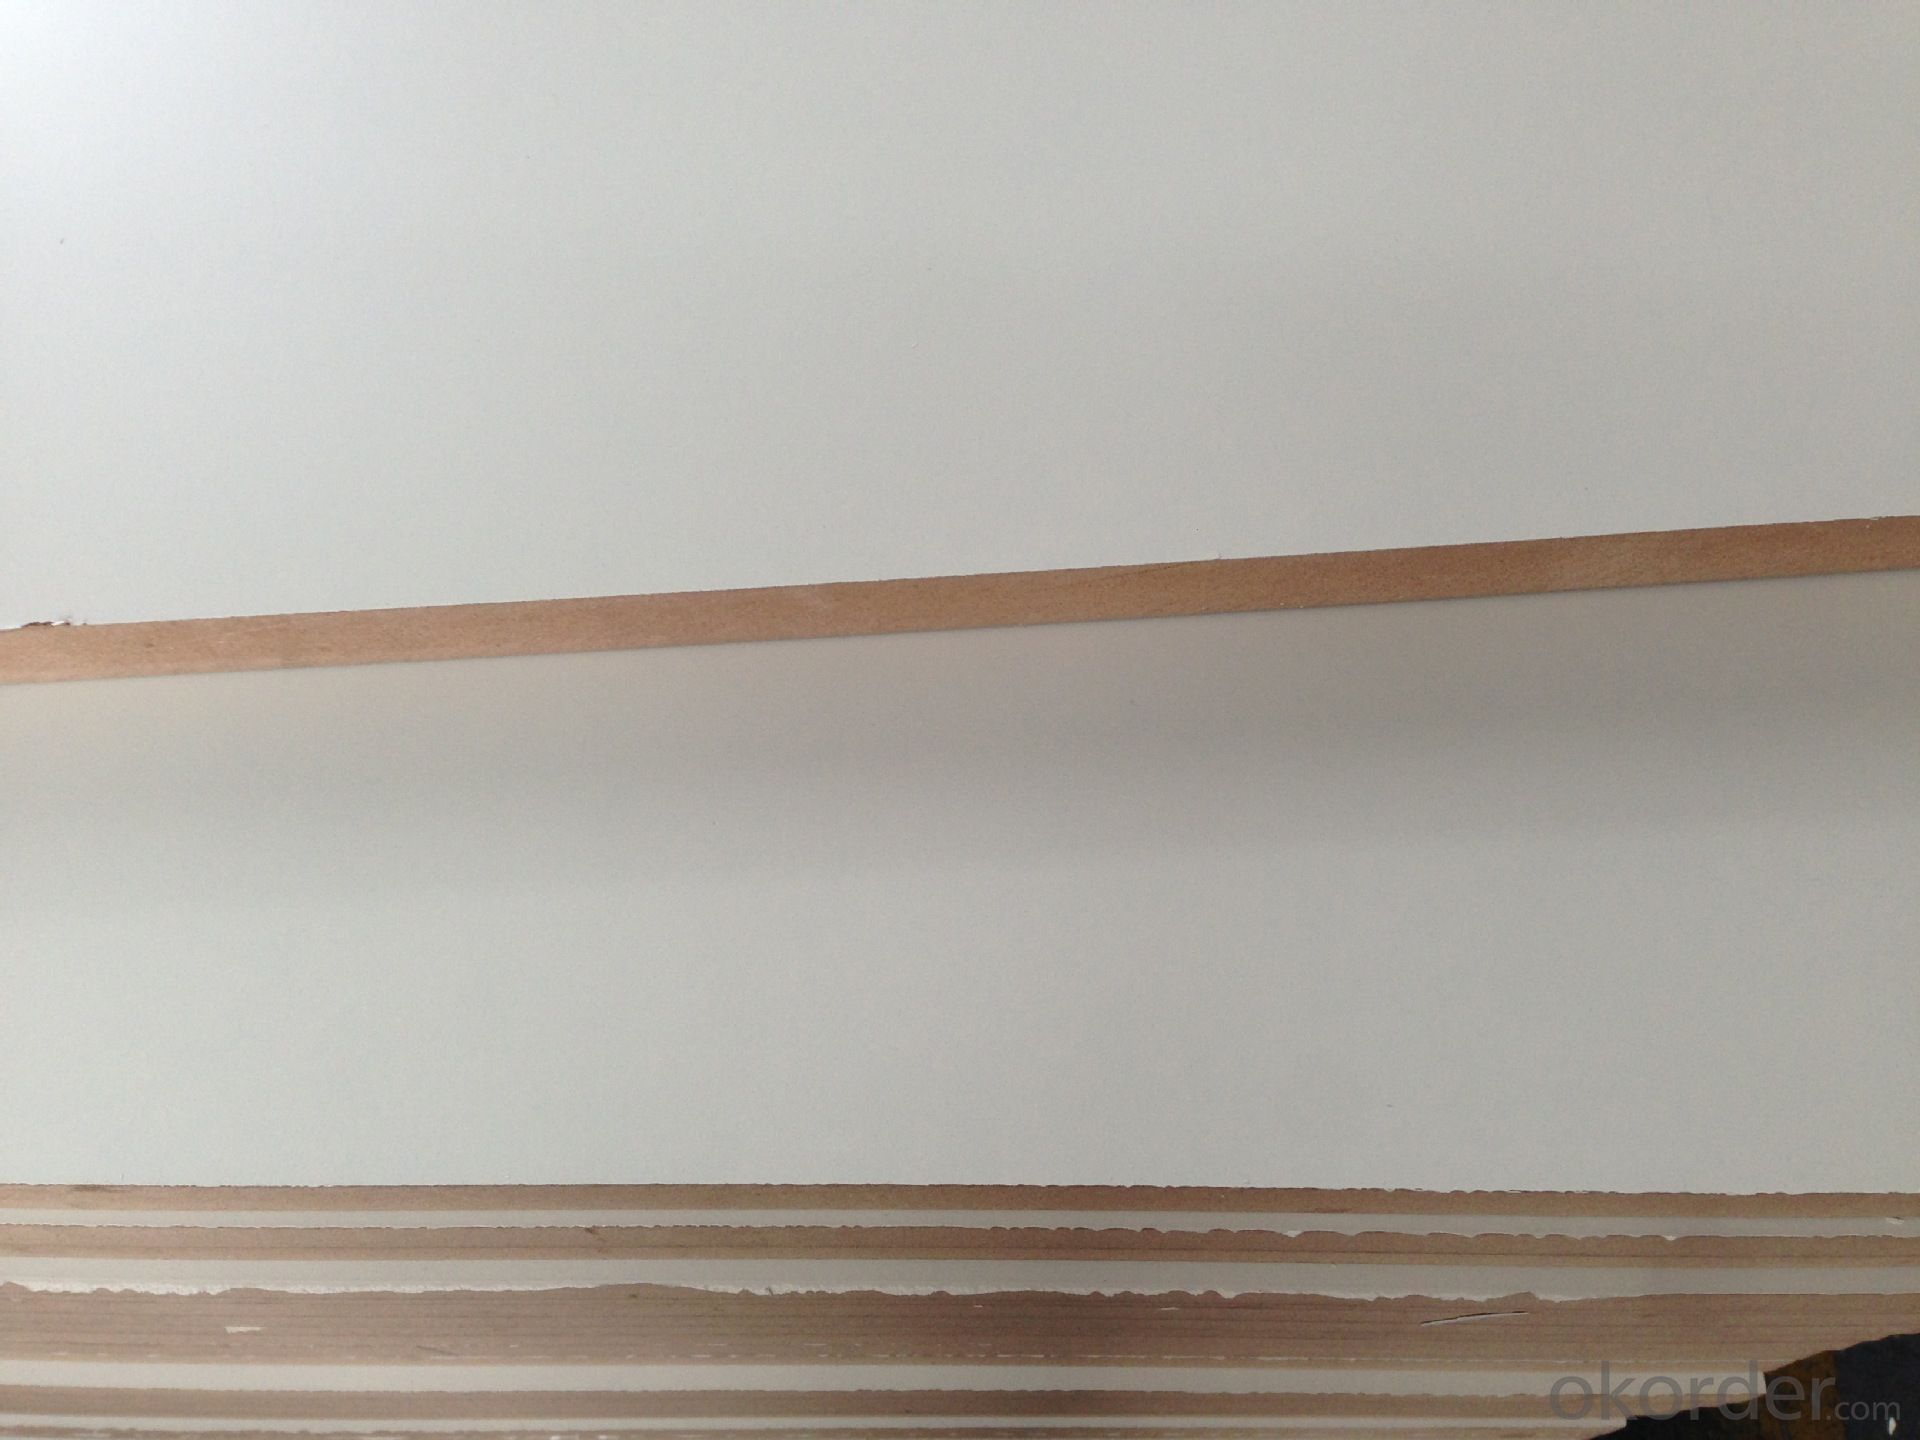 Buy Furniture Plain MDF board Raw MDF Sheet Melamine MDF Price,Size